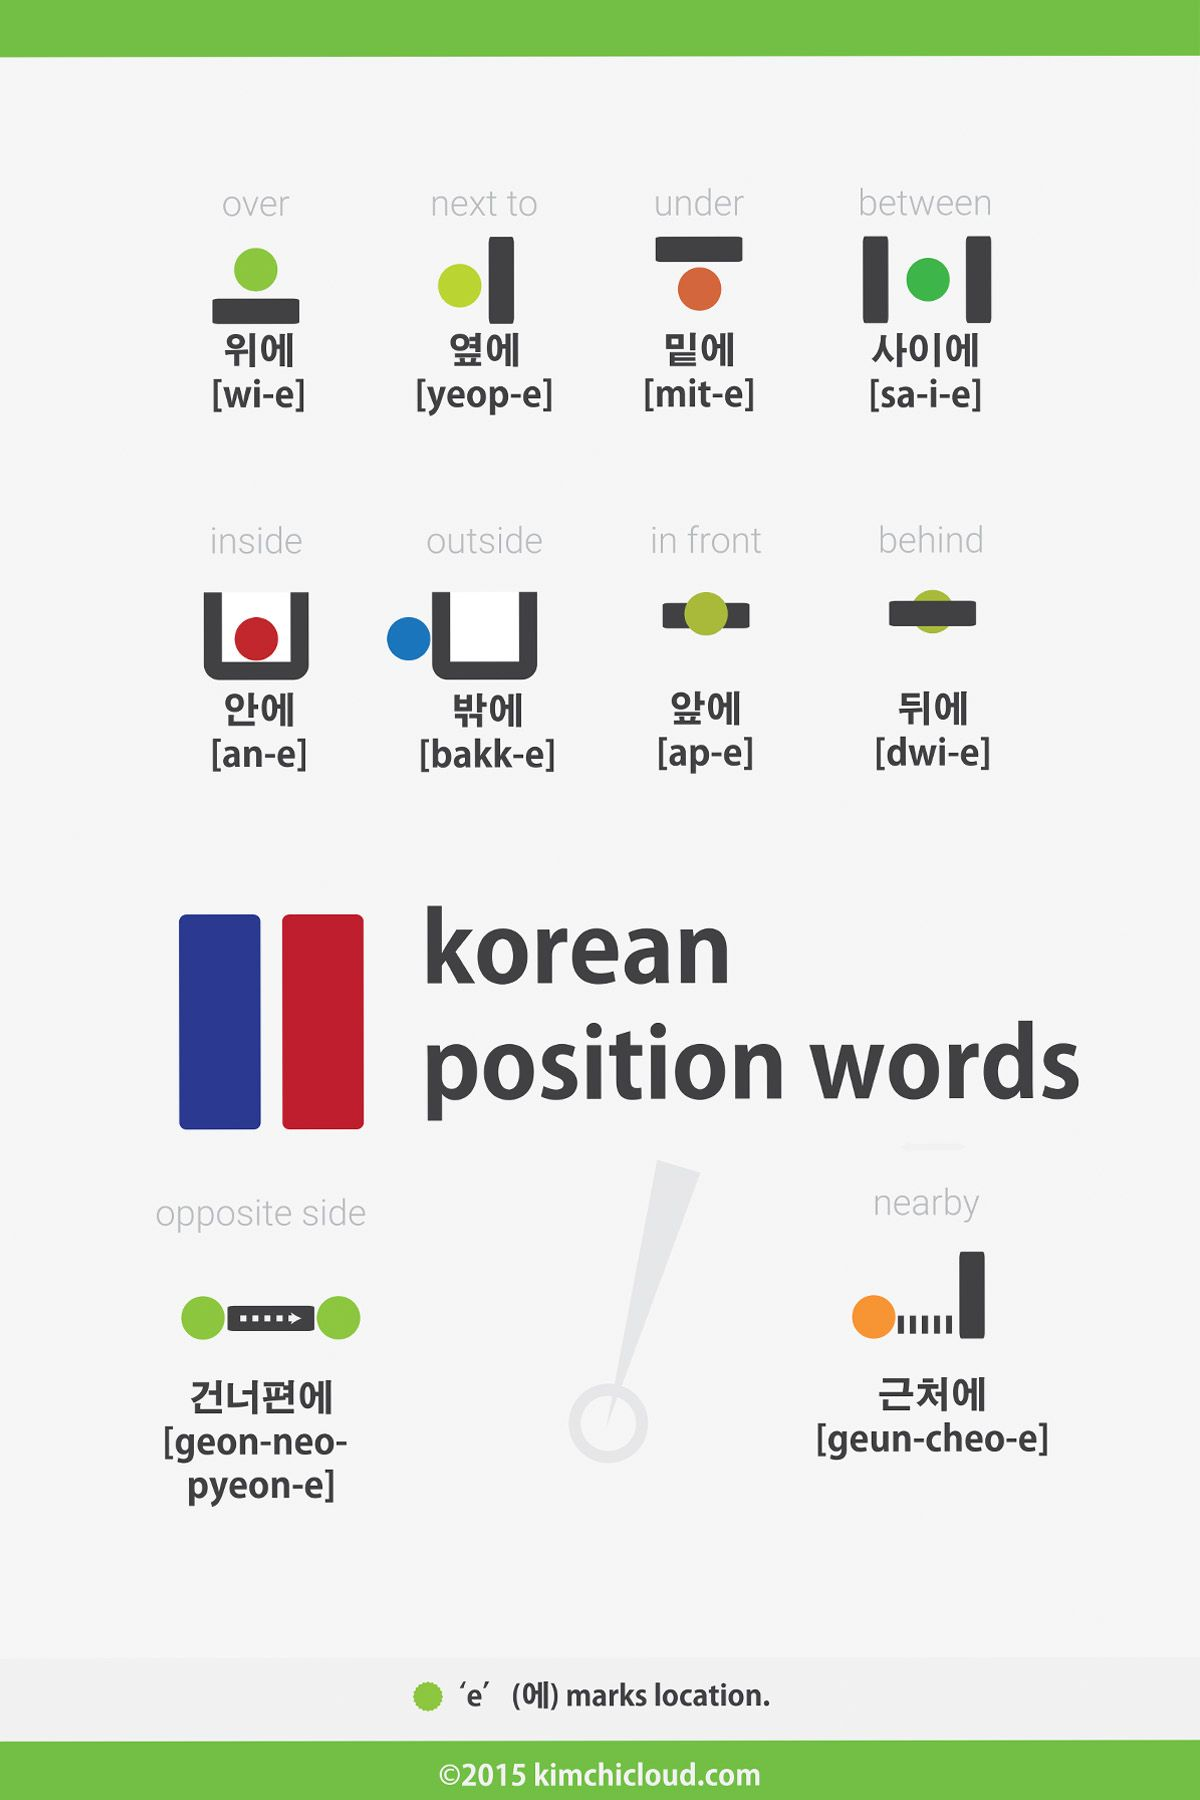 Korean position words prepositions over 위에 under 밑에